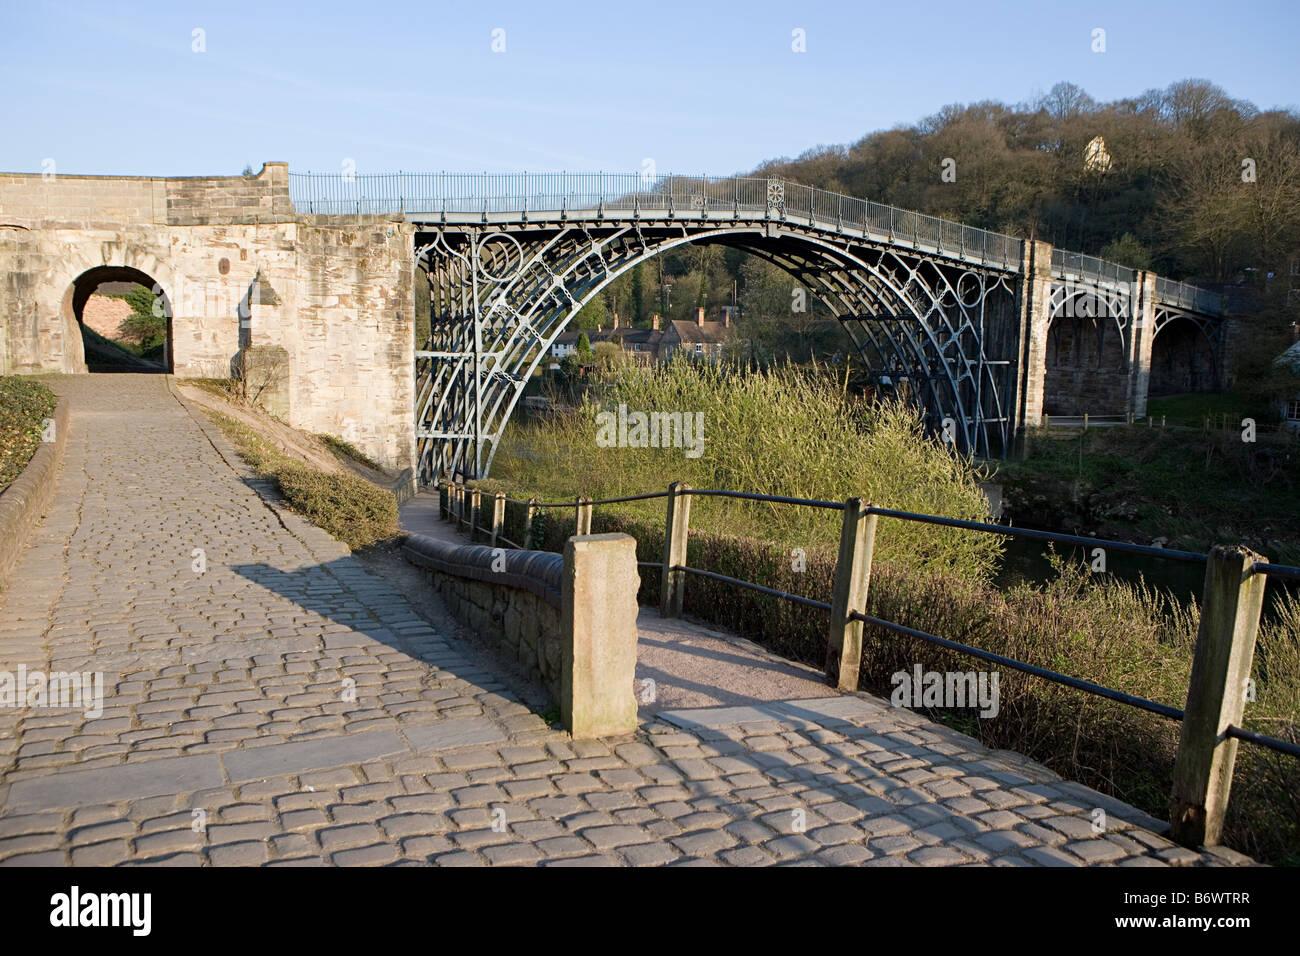 Iron bridge in shropshire - Stock Image